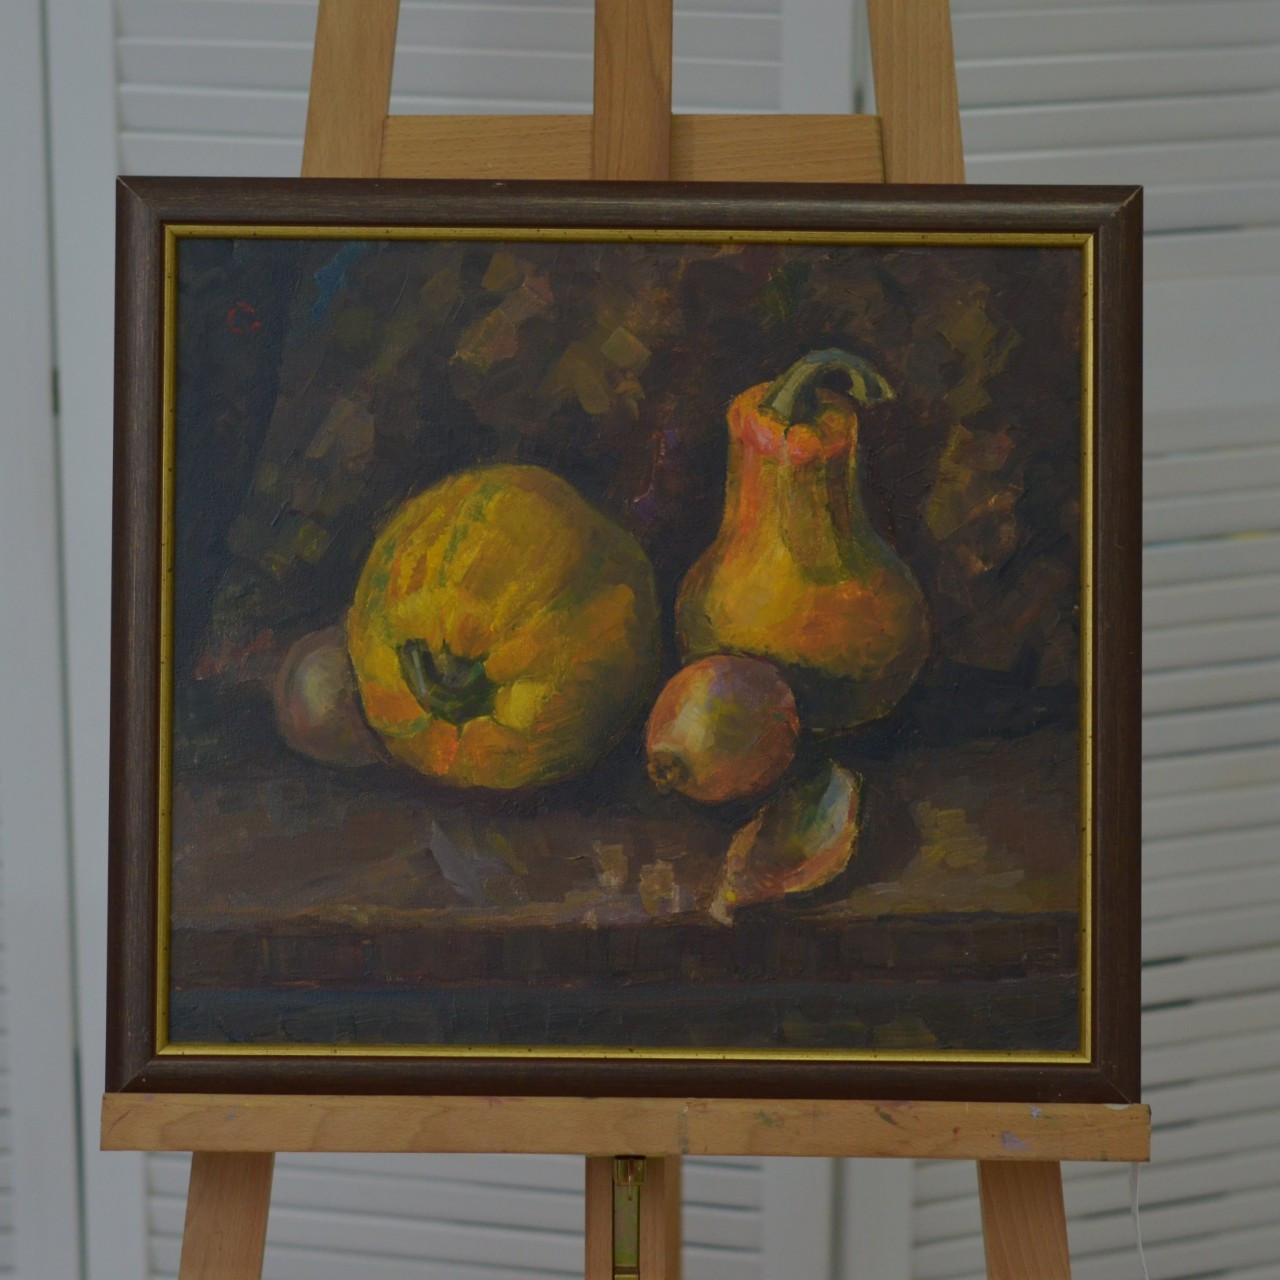 Картина натюрморт, картина маслом на кухню, в кафе, ресторан